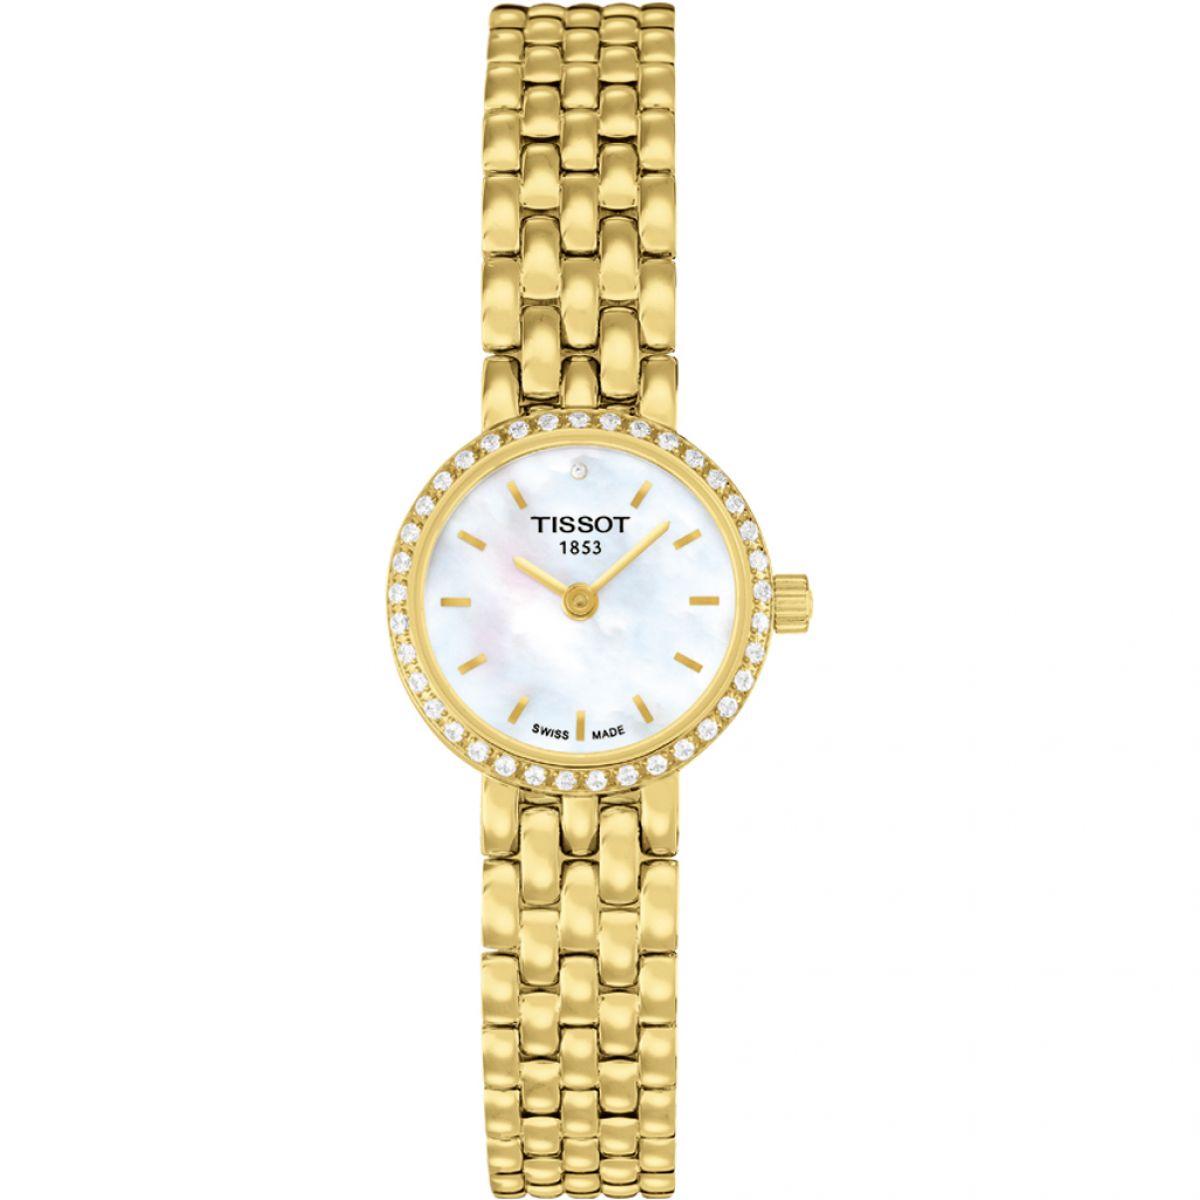 Tissot Lovely Diamond Watch